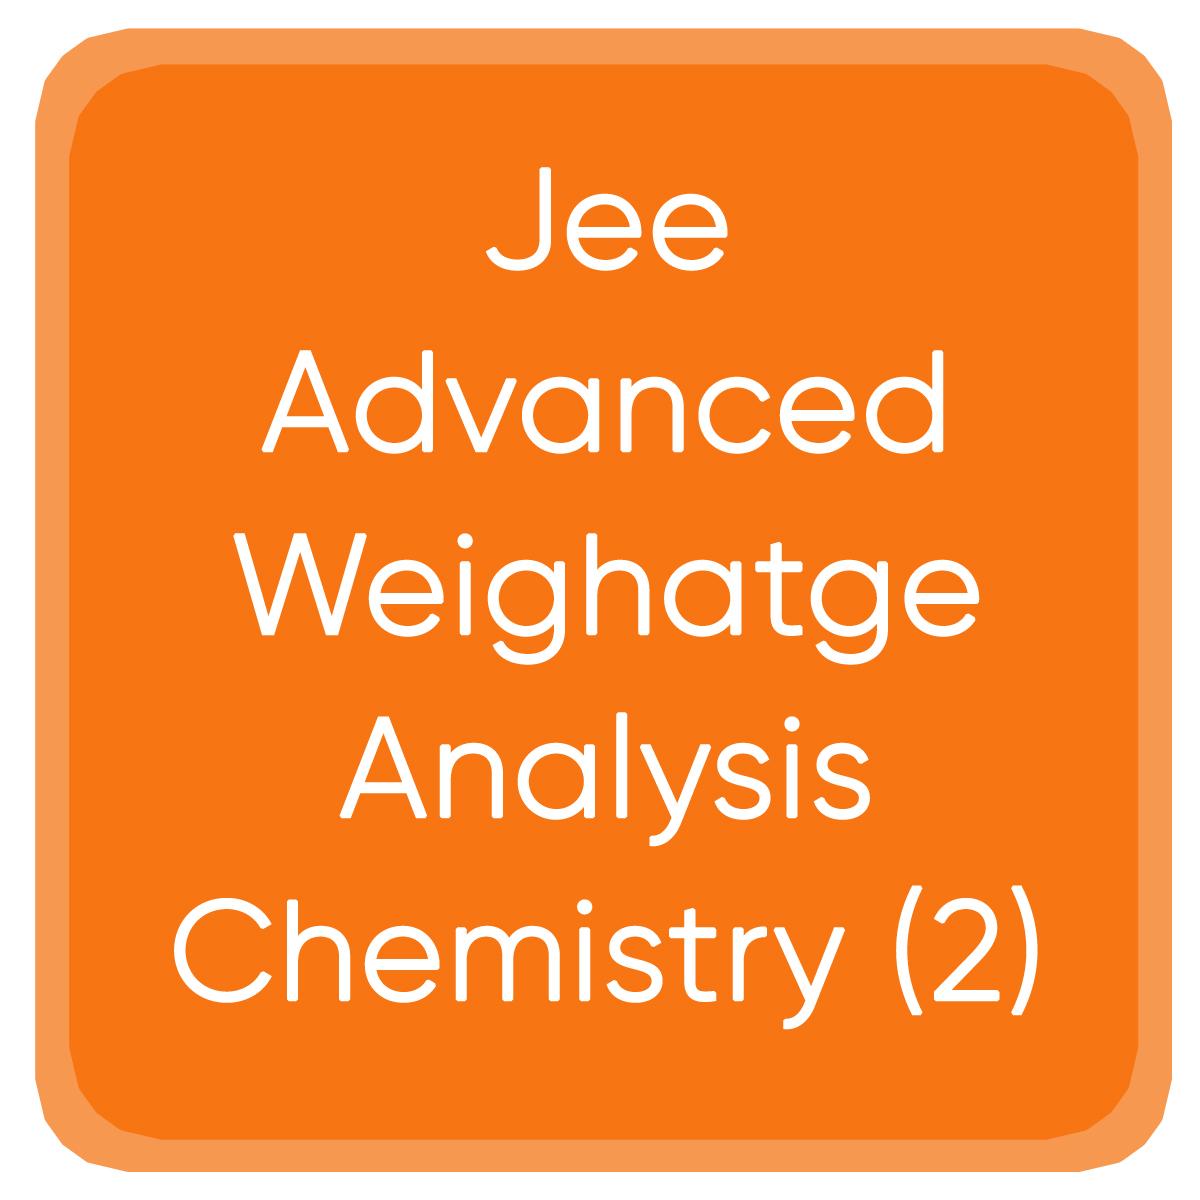 Jee Advanced Weighatge Analysis Chemistry (2)